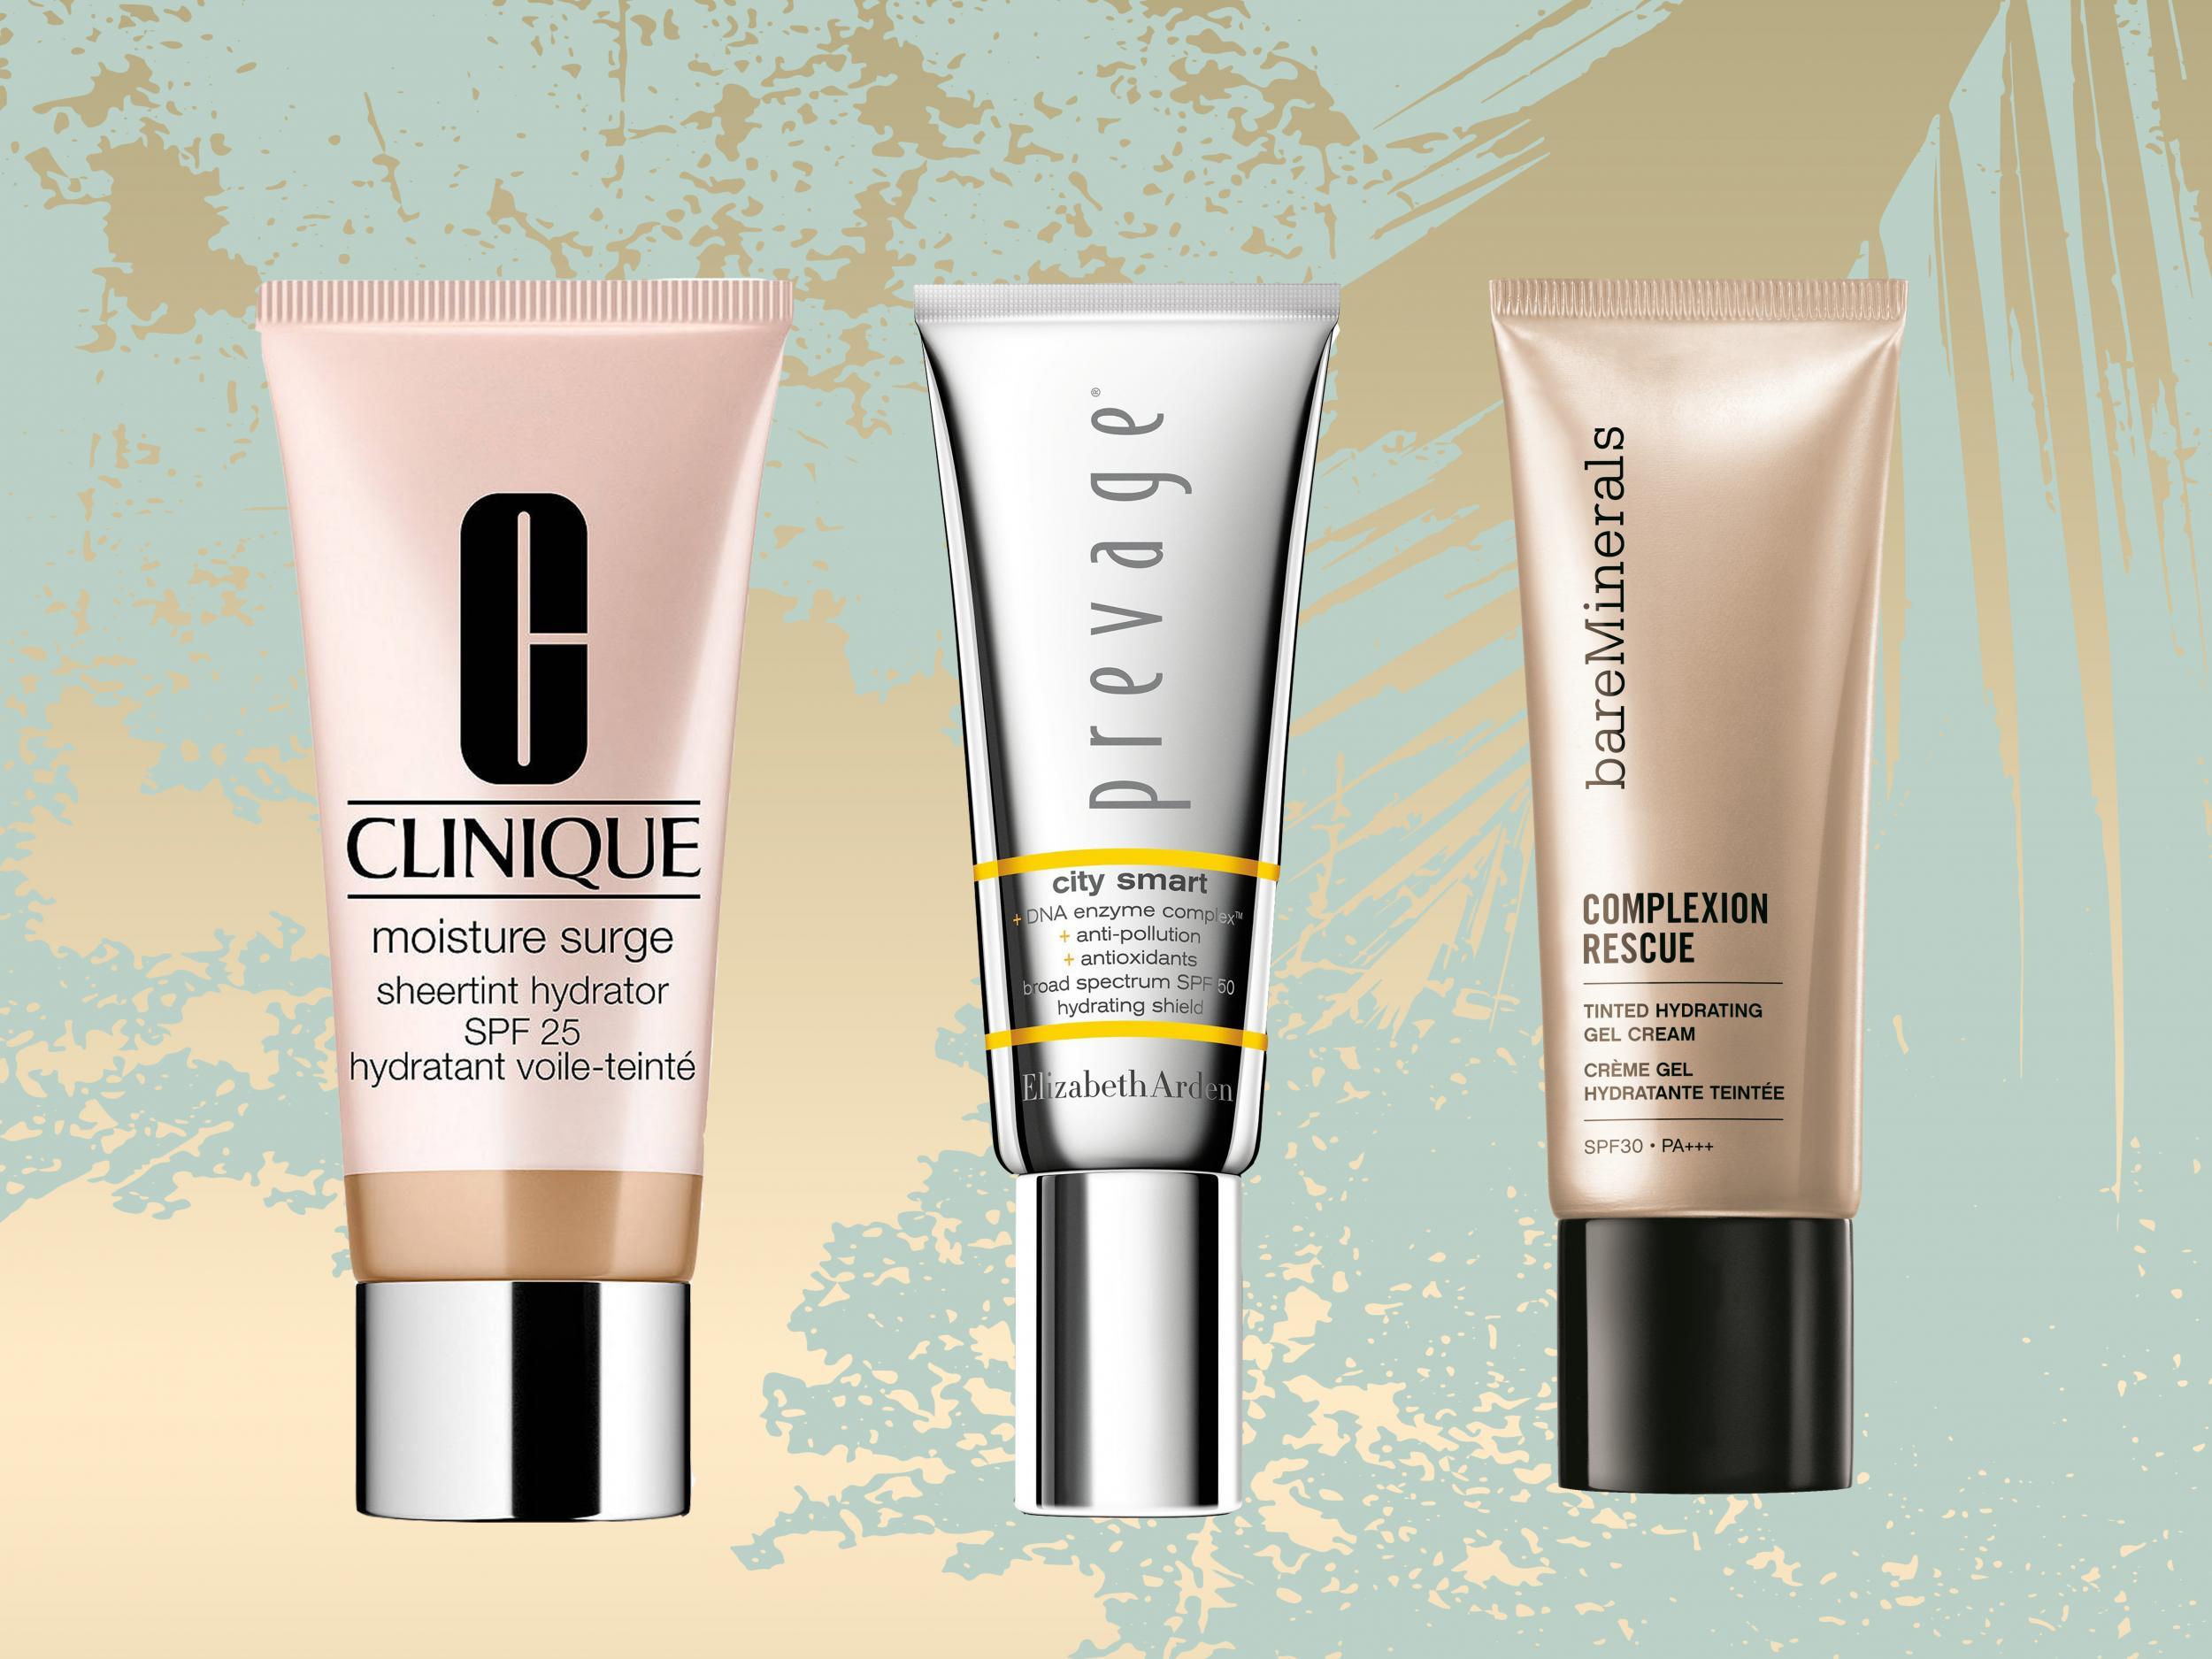 Best tinted moisturiser: Choose from formulas that add